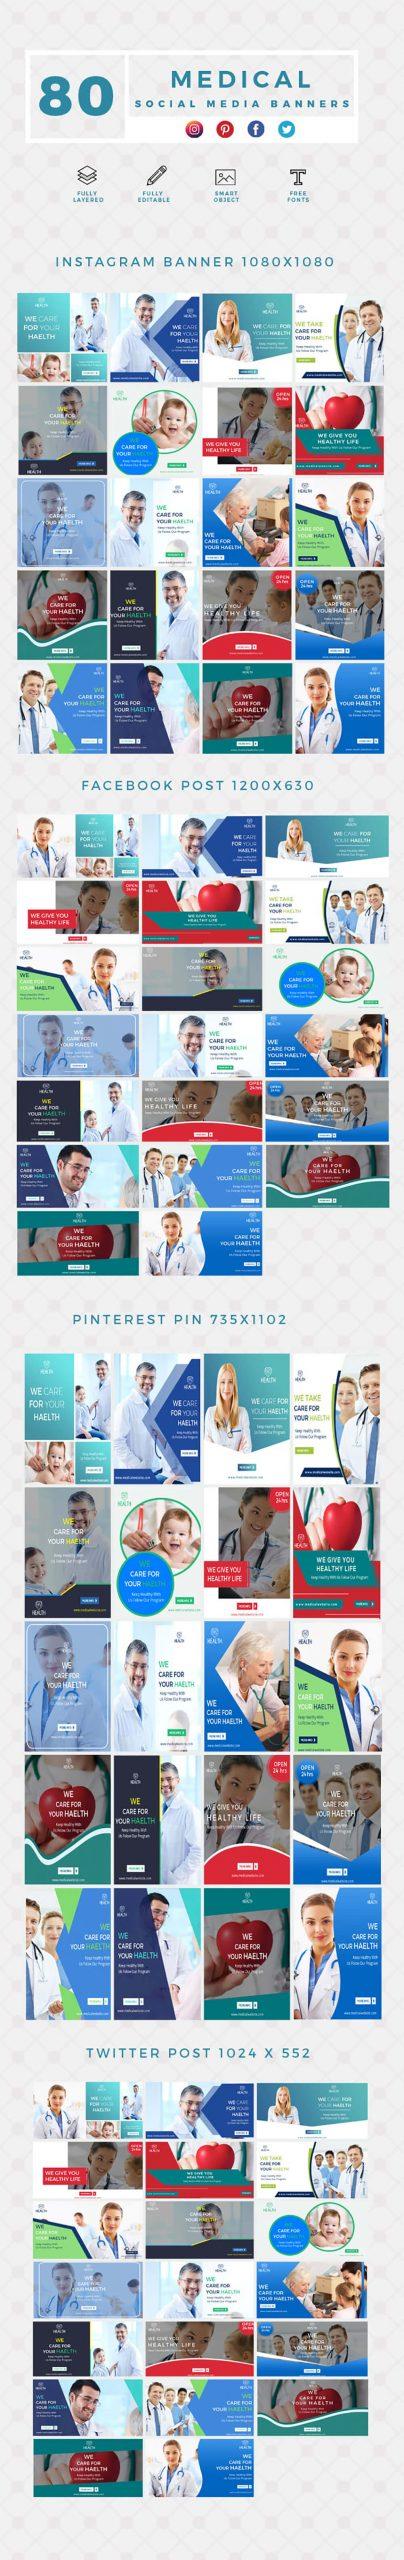 640 Social Media Banner Templates Bundle PREVIEW-MEDICAL